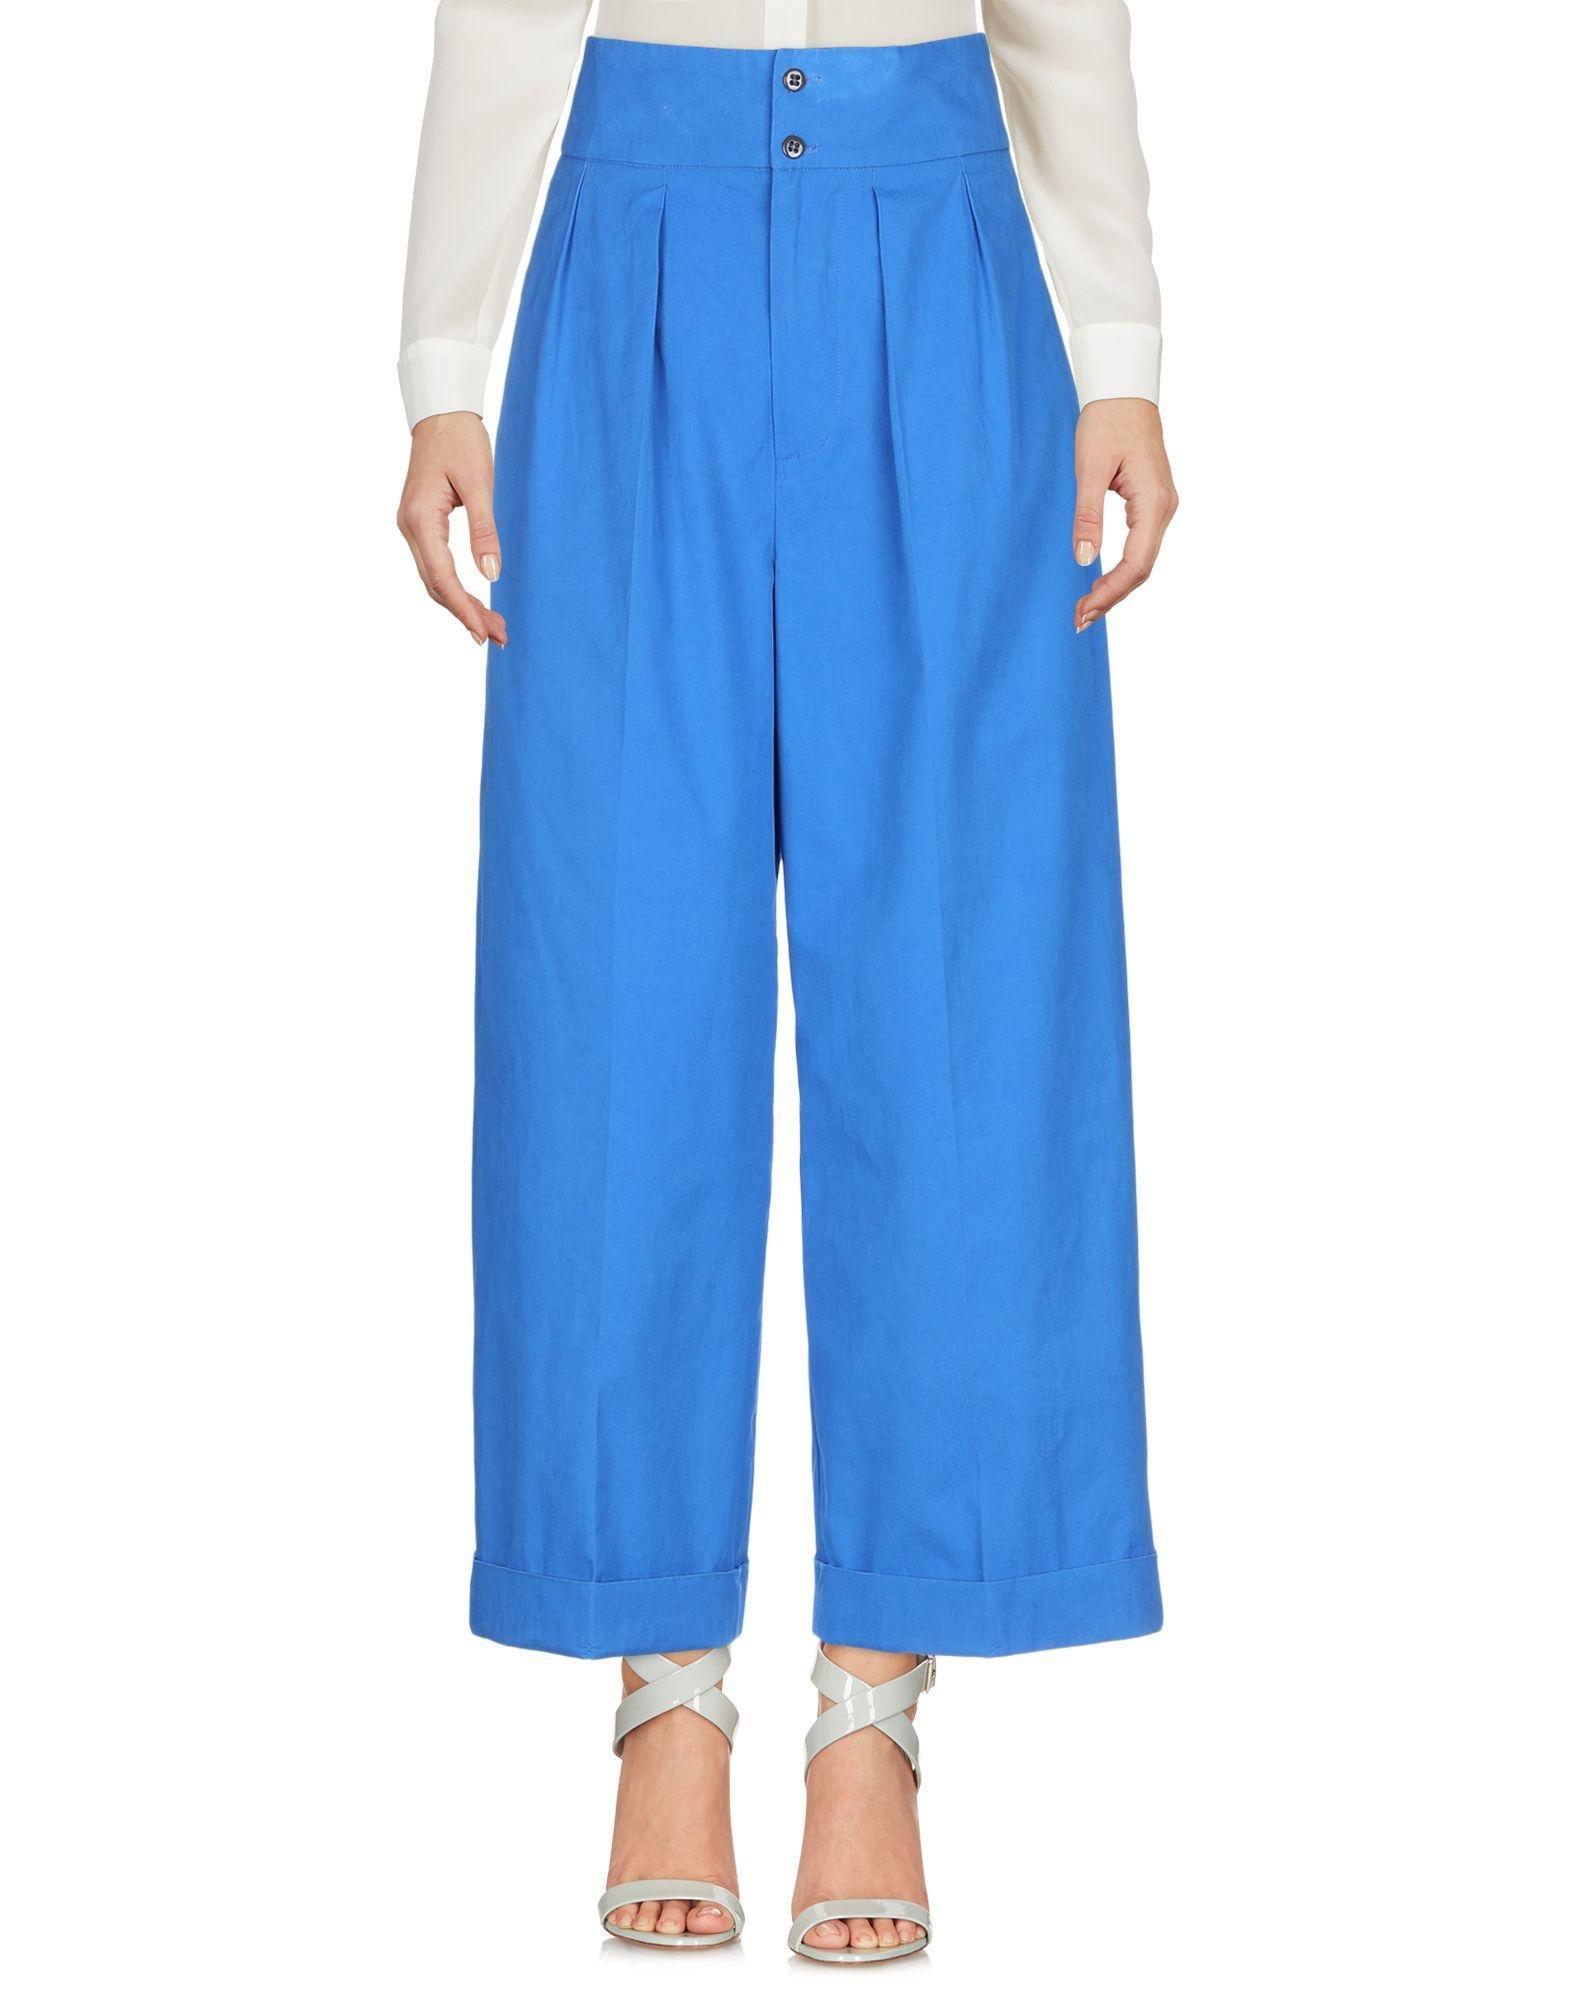 Pantalones Bellerose de Algodón de color Azul